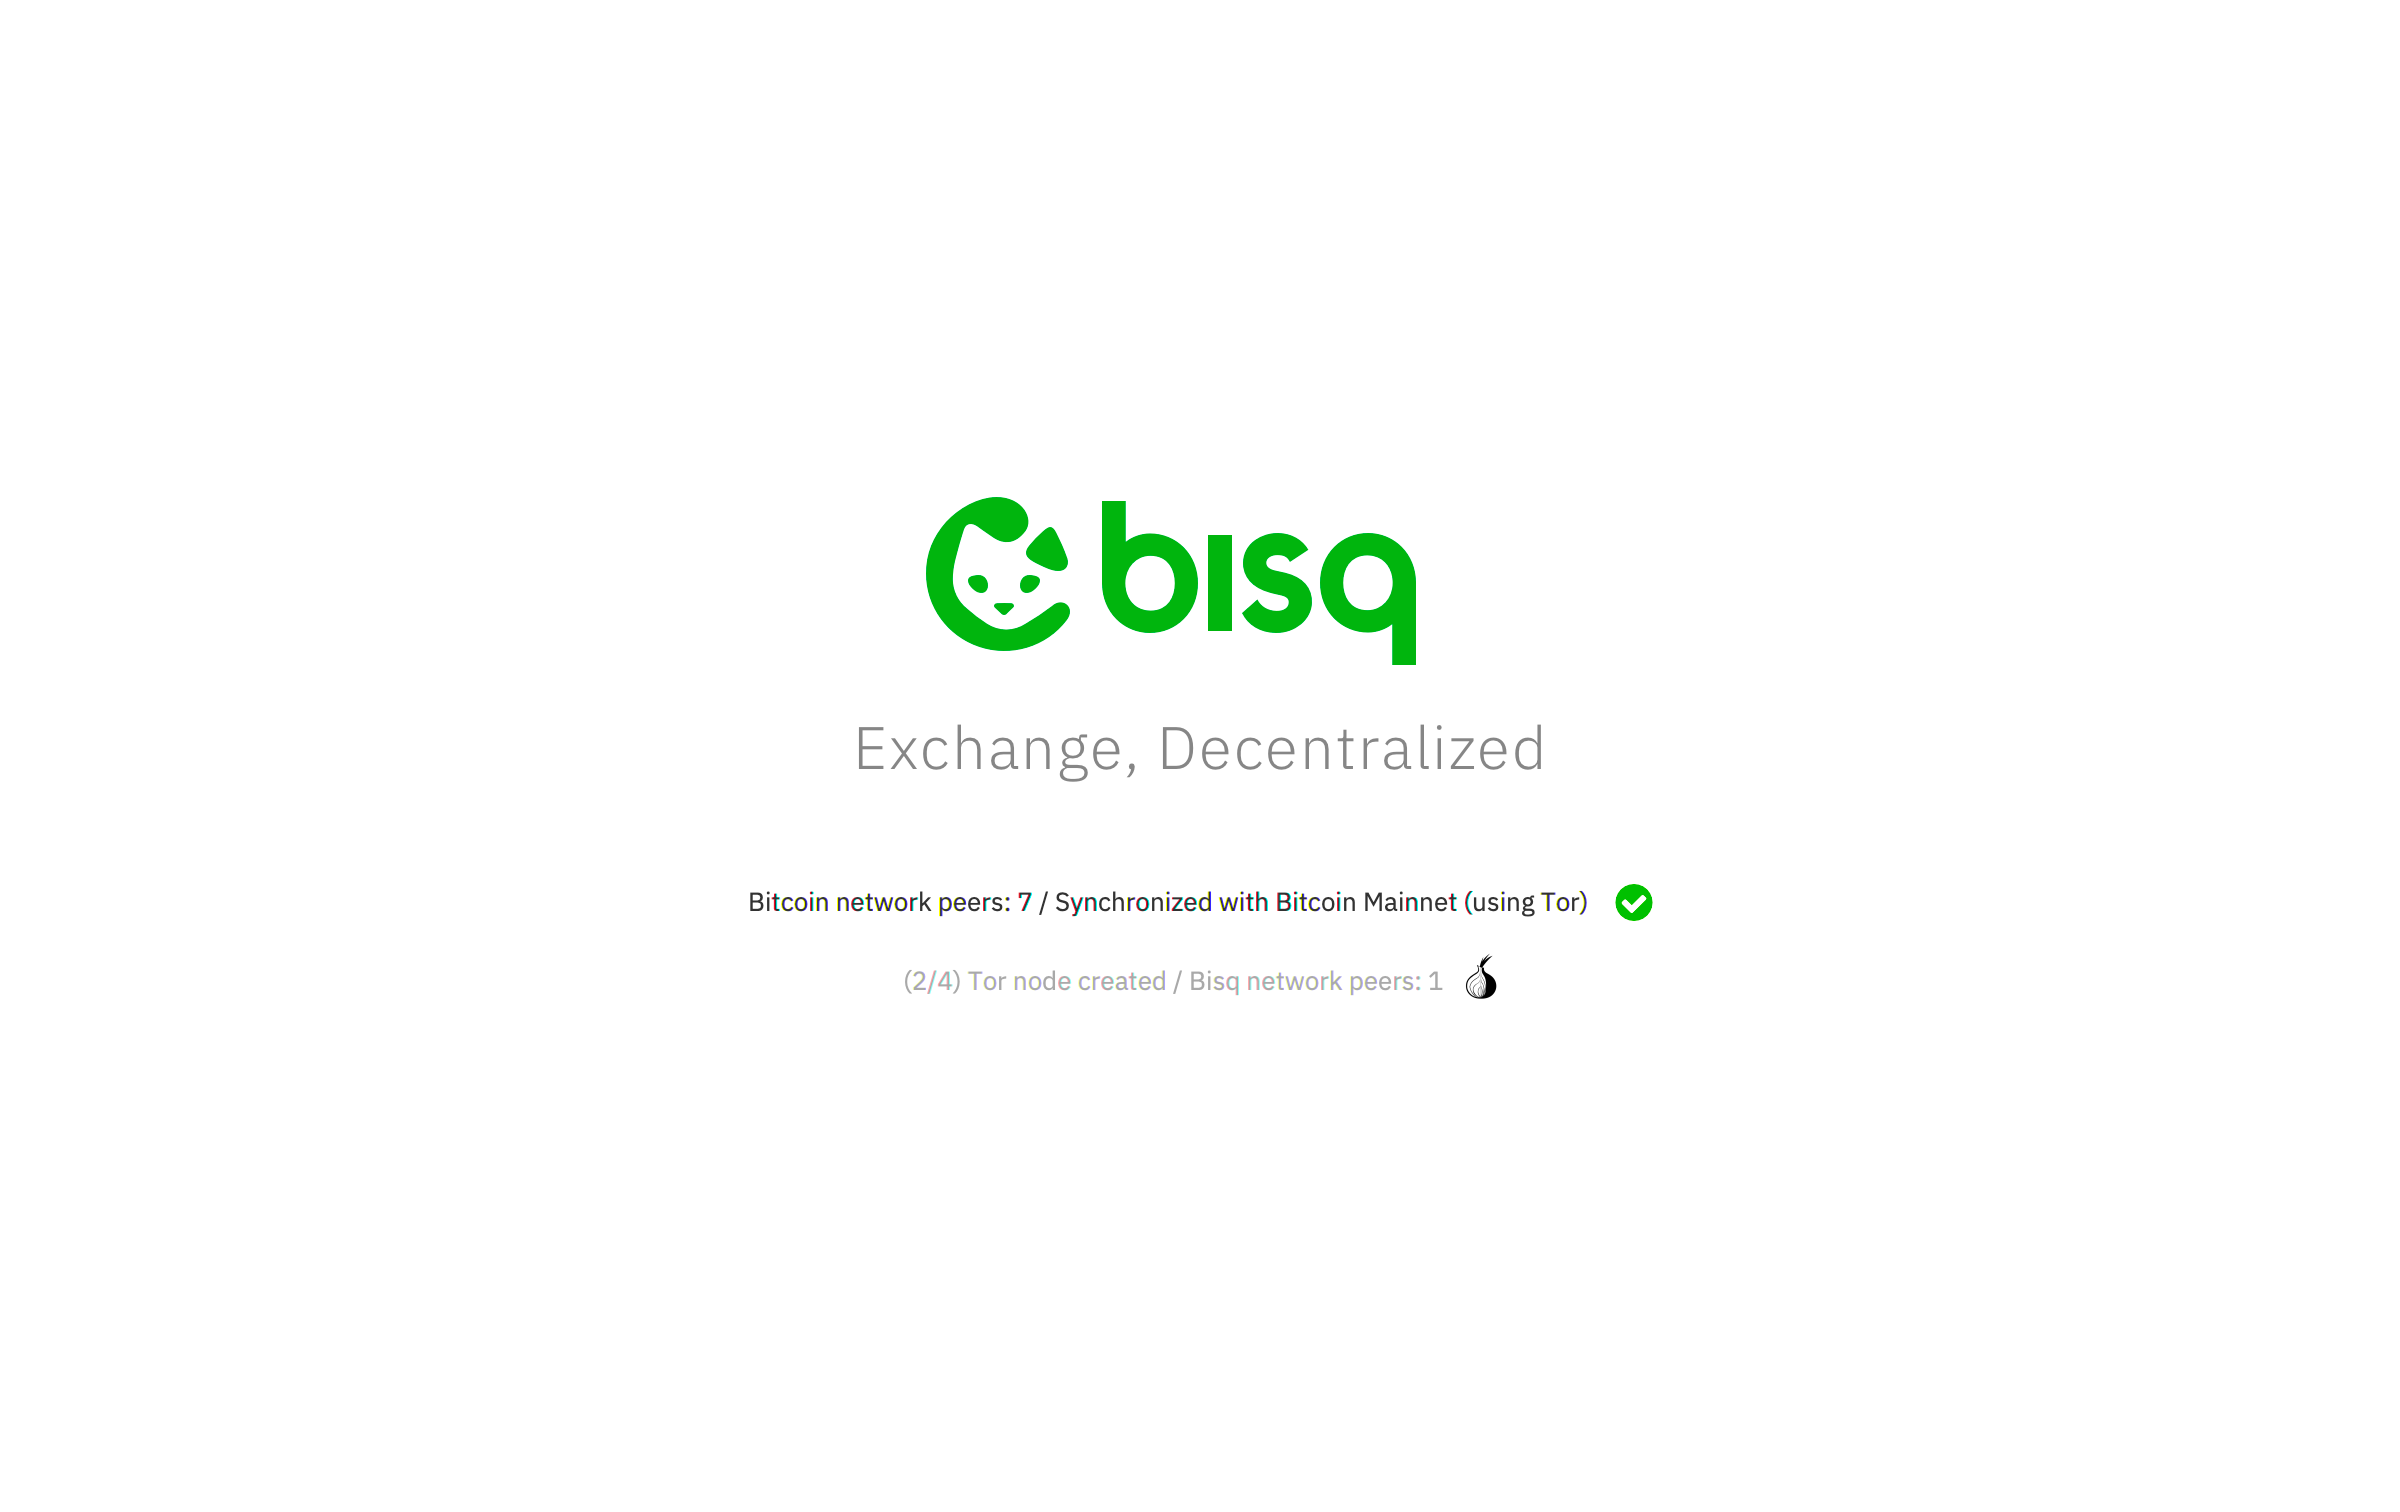 befektetések bitcoin projektekbe fl studio